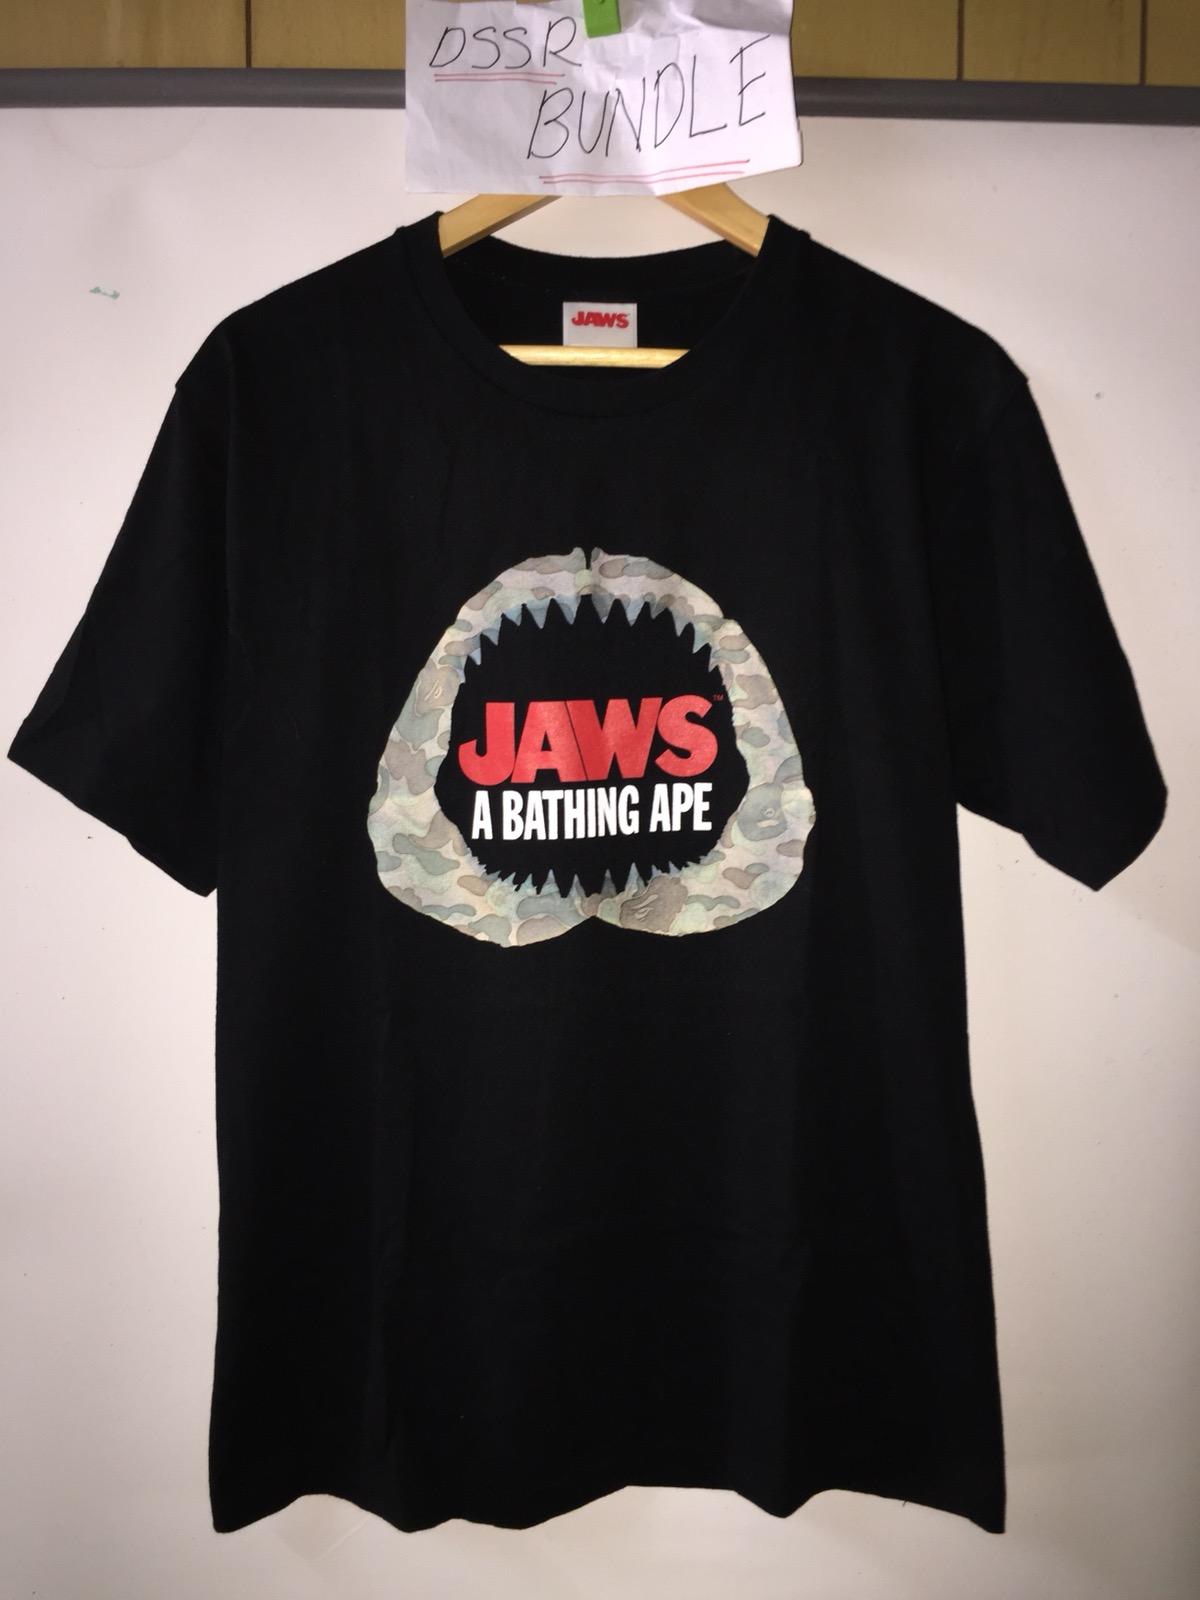 e5b8aa4dd Bape Bape X Jaws By Bathing Ape | Grailed